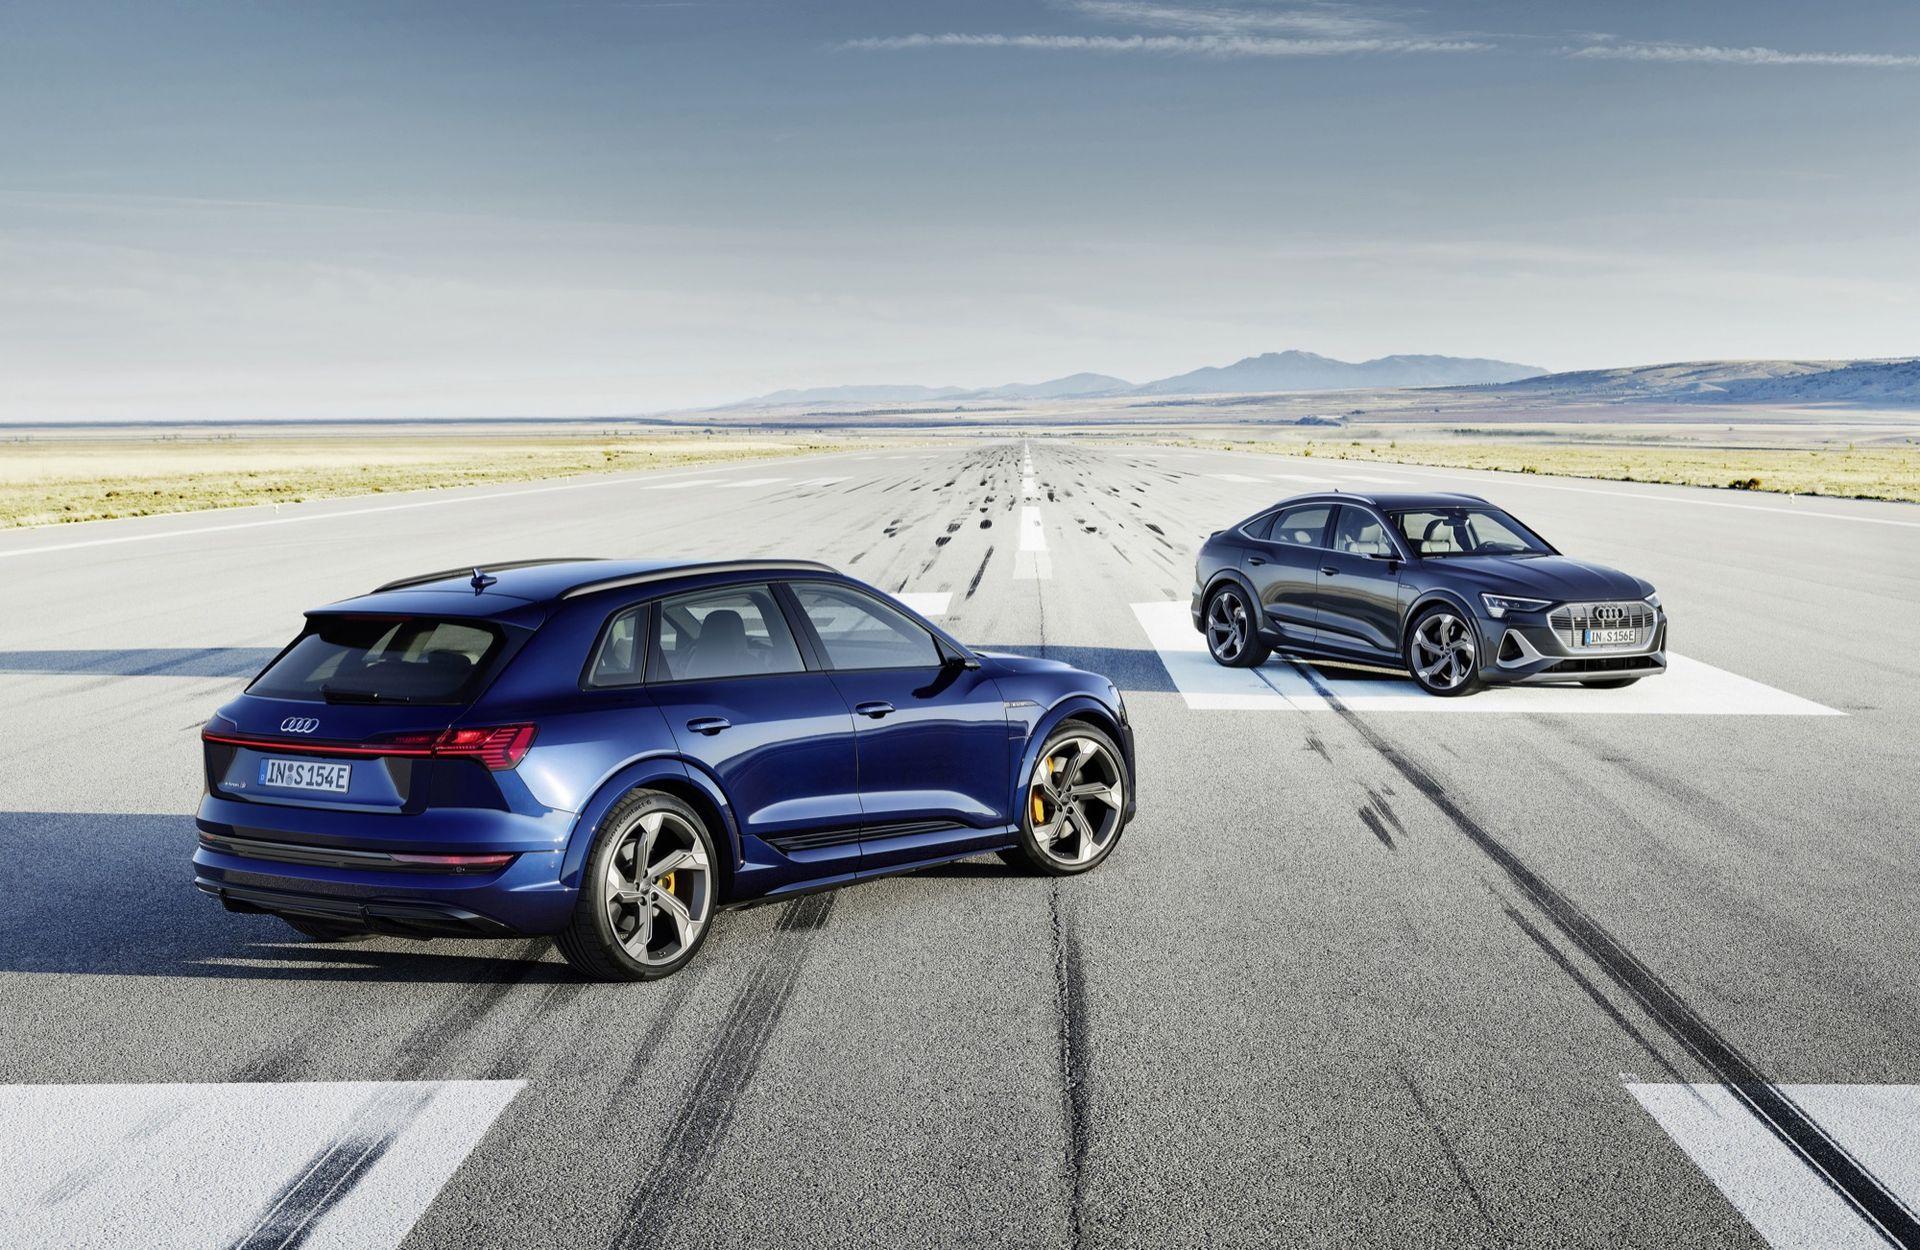 Nu kan du beställa Audi e-tron S och e-tron S Sportback